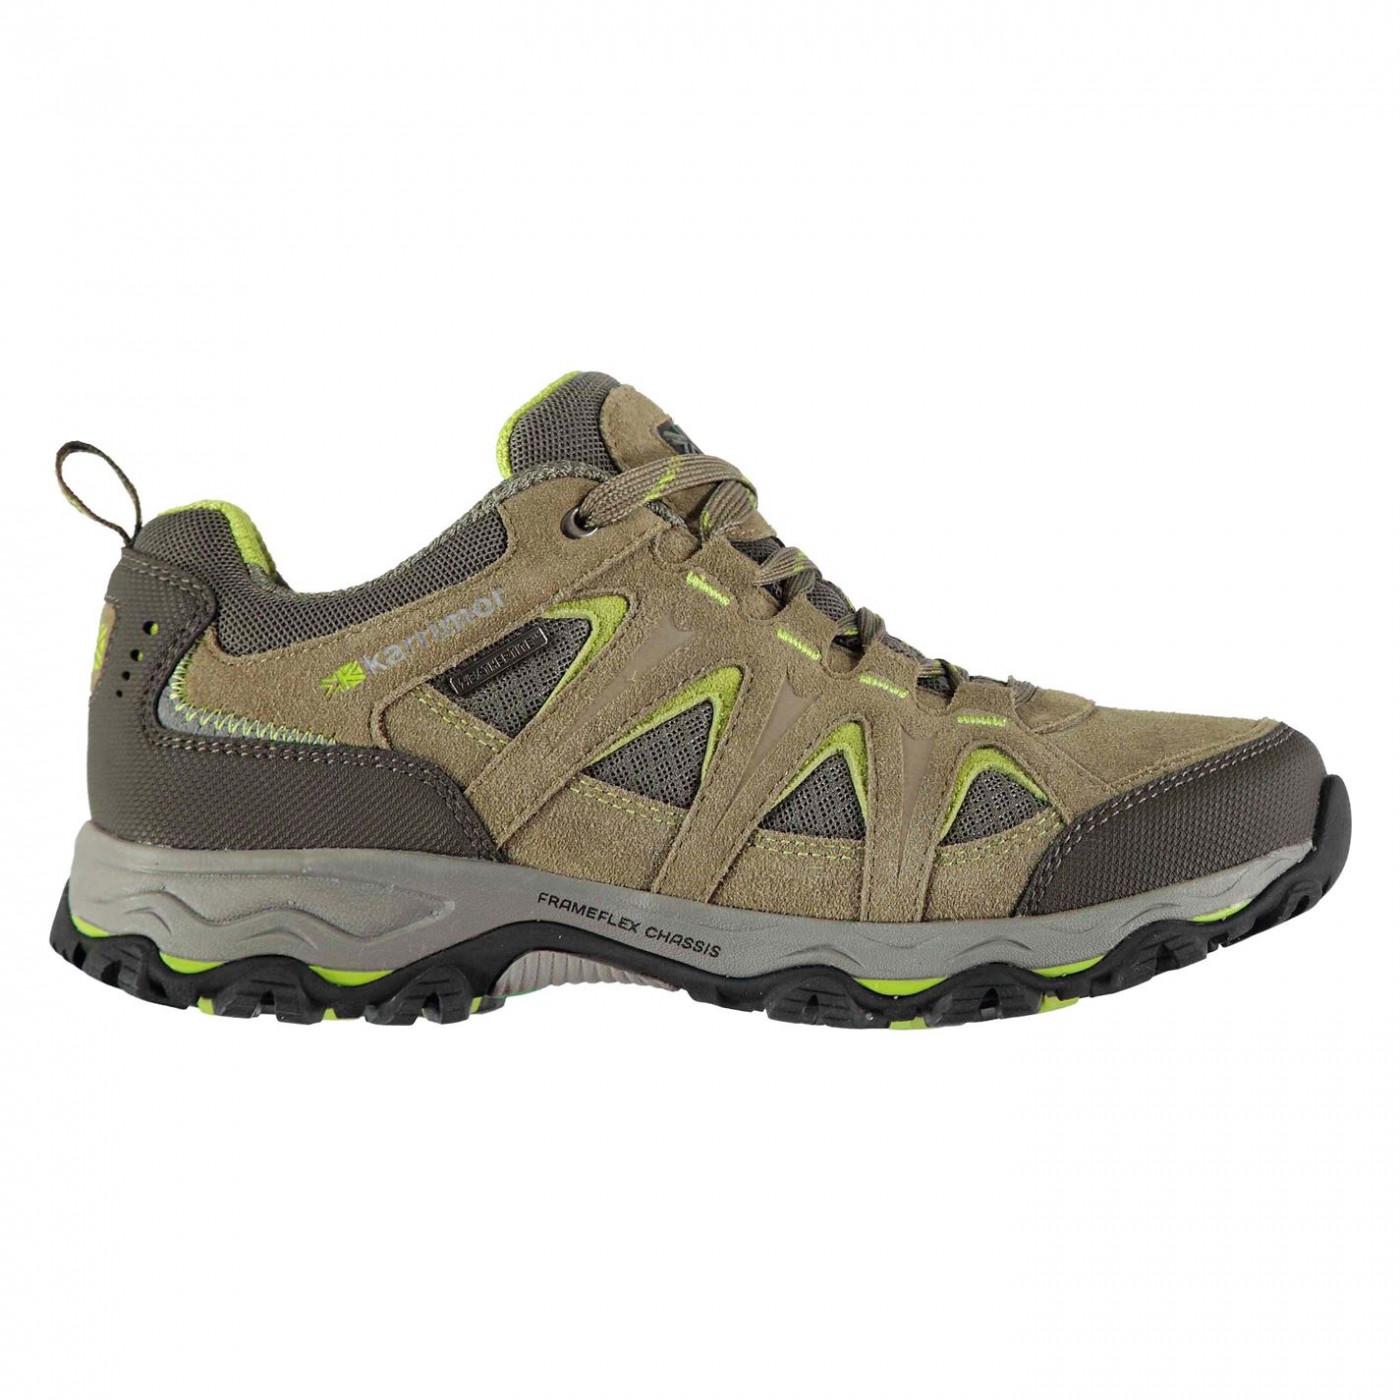 Karrimor Mount Low dámské Walking Shoes